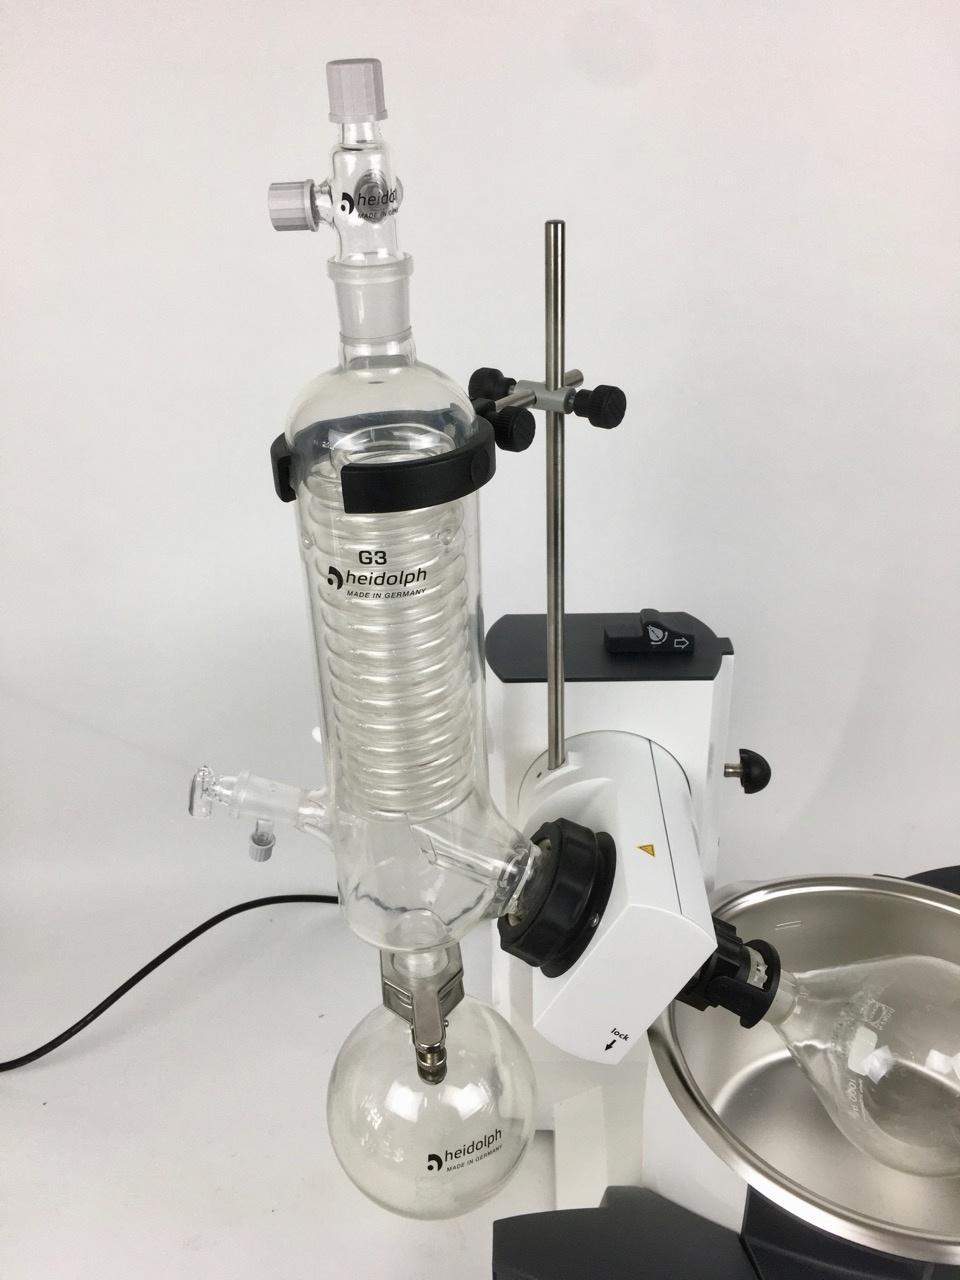 Heidolph Heidolph Base Hei-Vap rotary evaporator